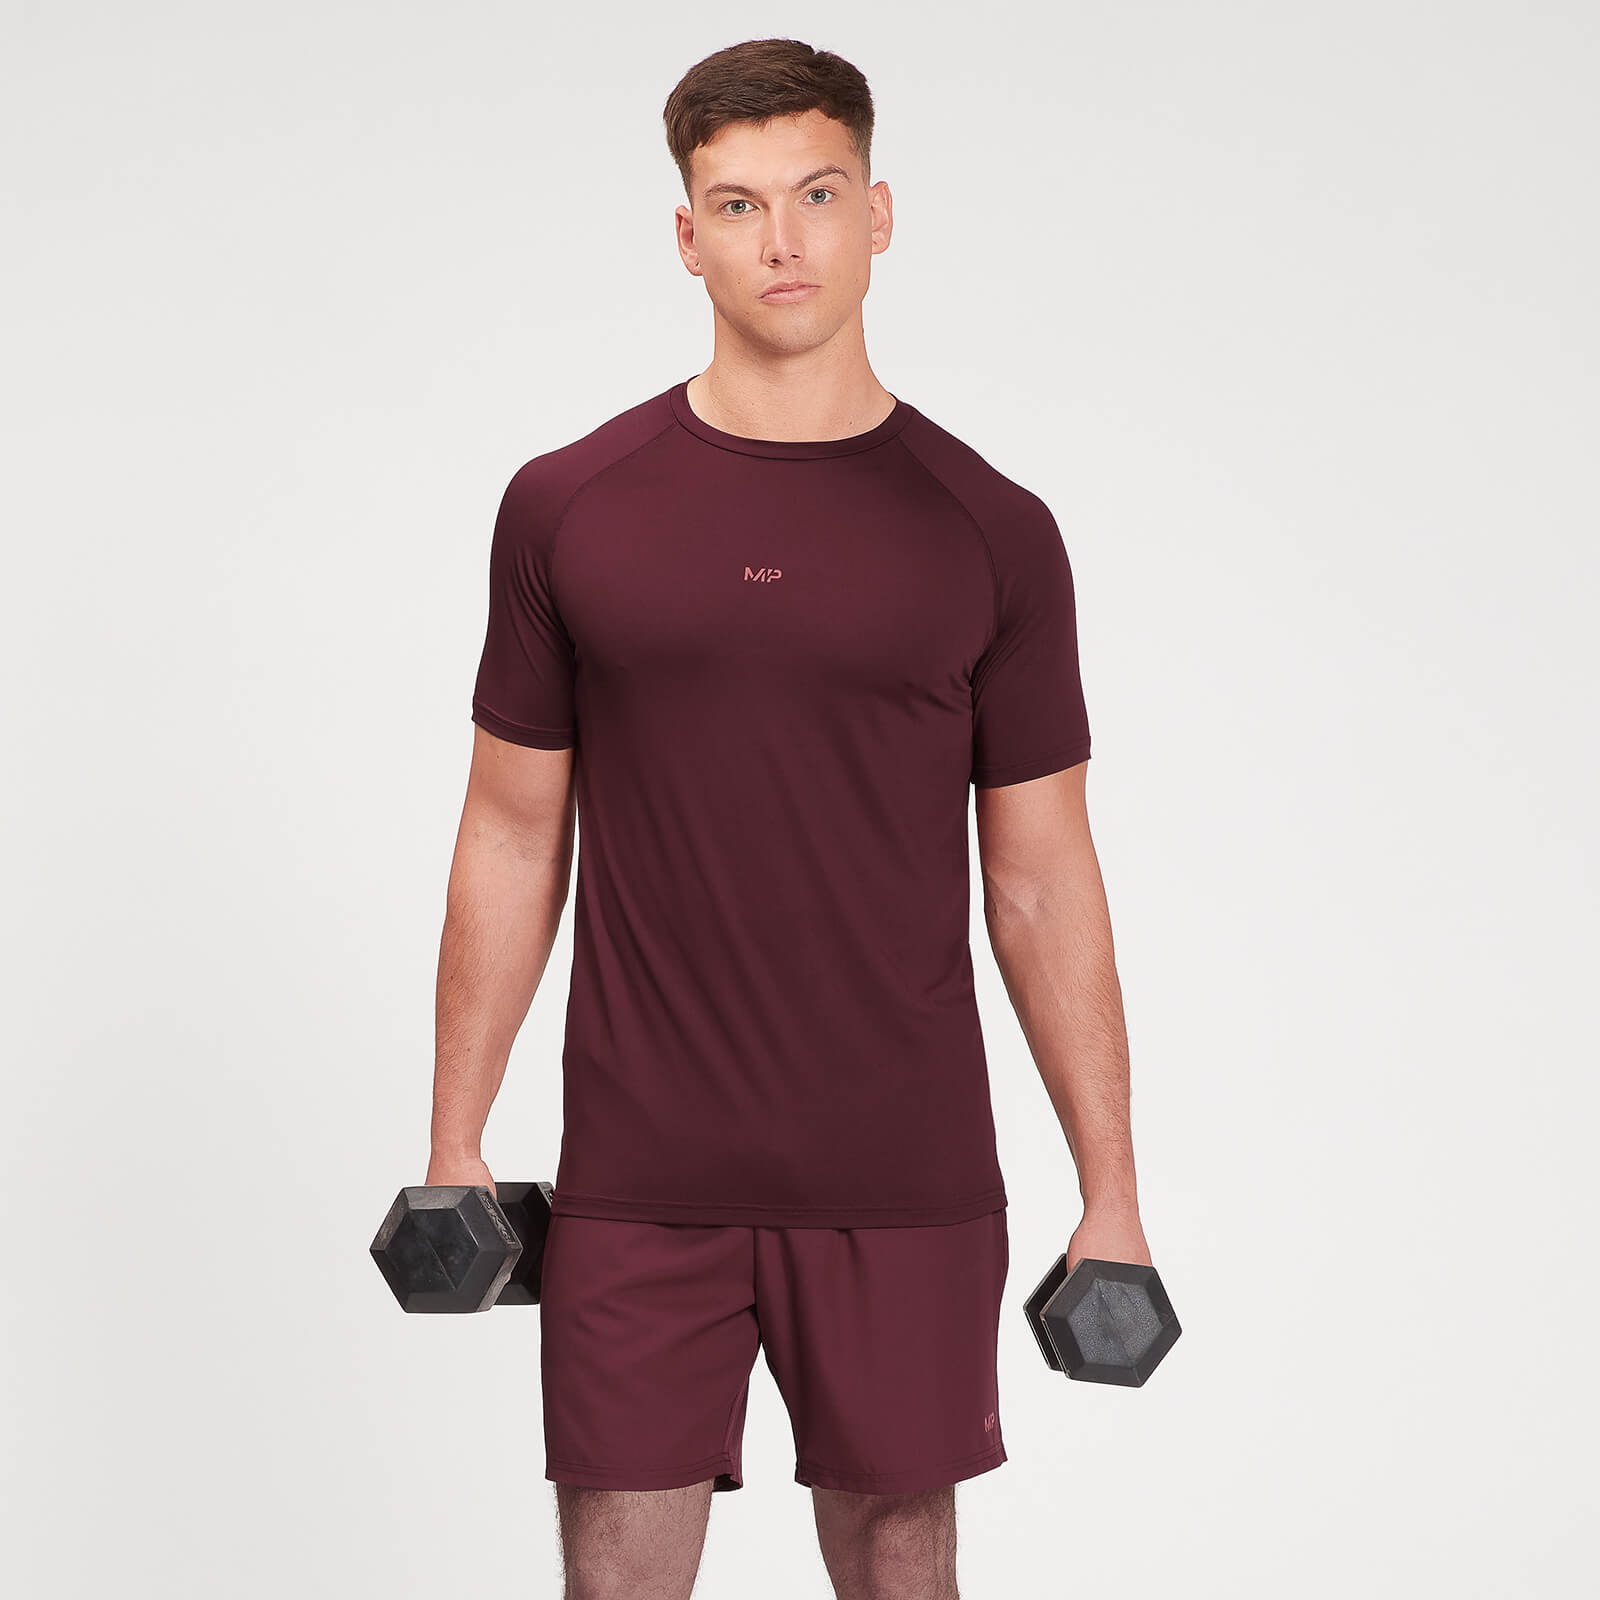 Купить Мужская футболка с короткими рукавами MP Graphic Training - XXL, Myprotein International